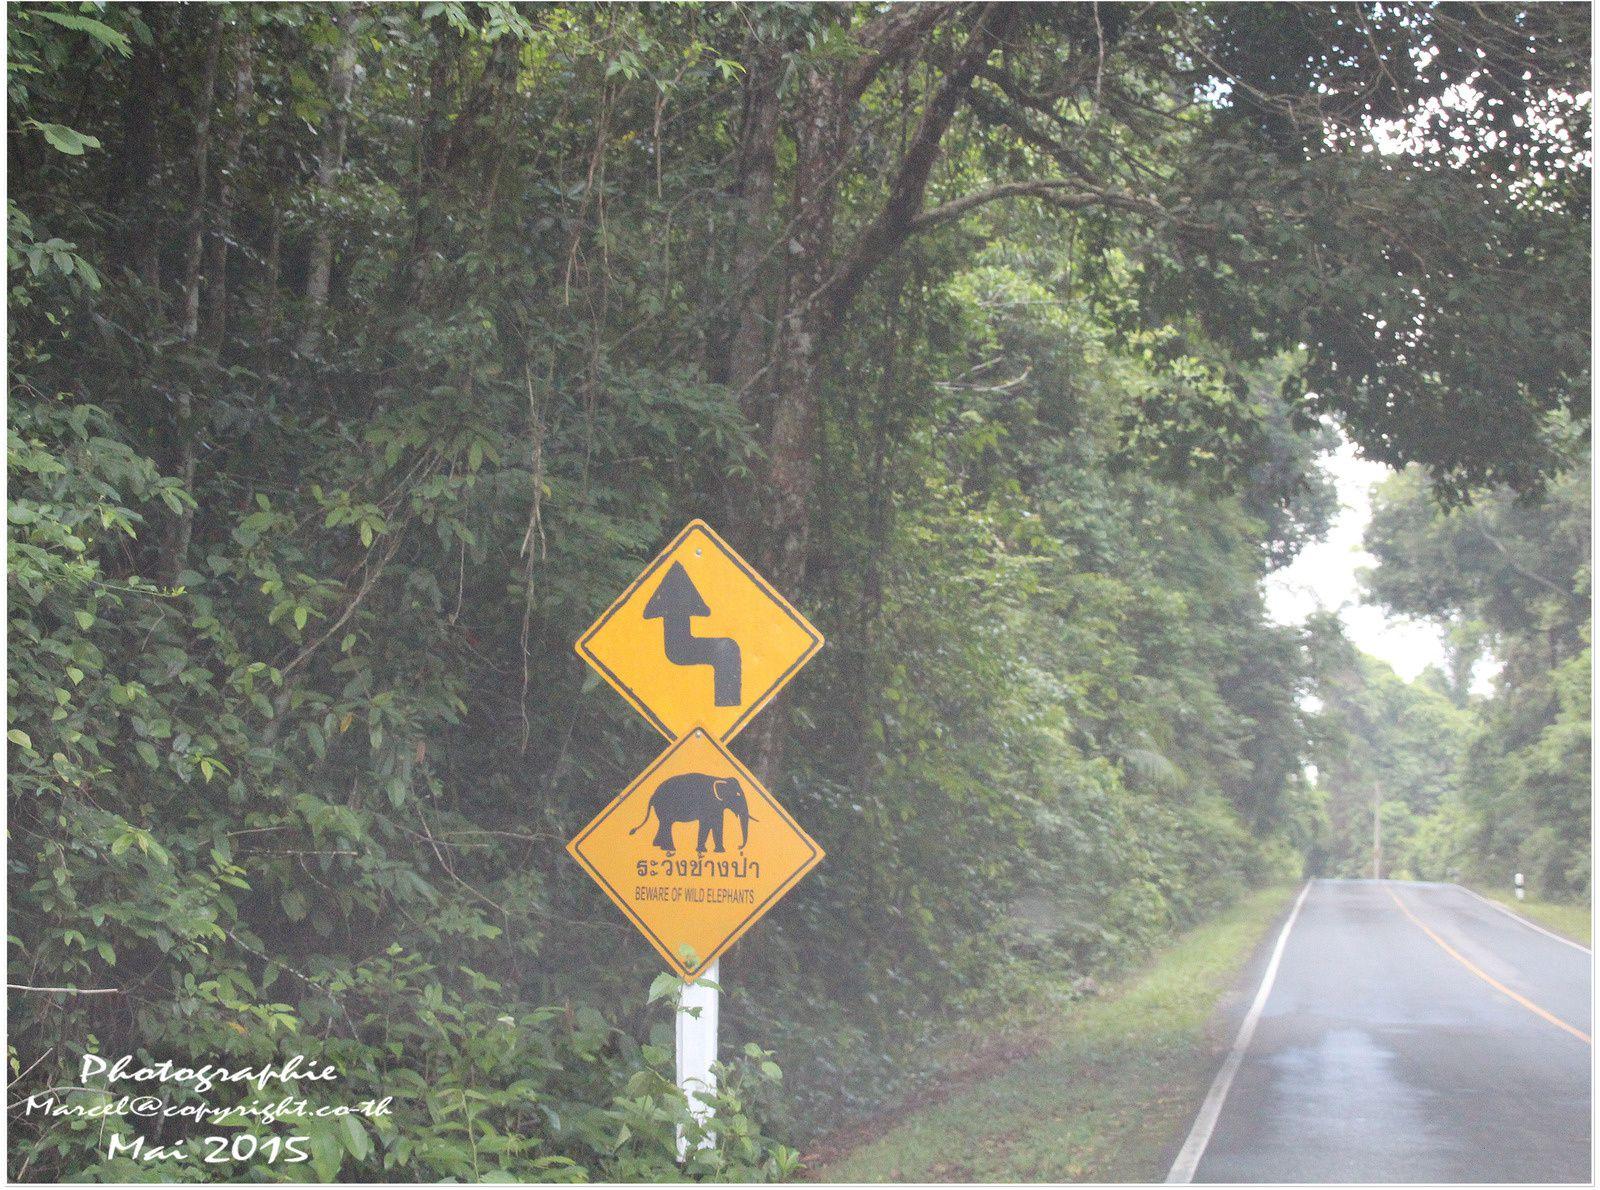 Les parcs nationaux de Thaïlande  &quot&#x3B;Khao Yai&quot&#x3B;